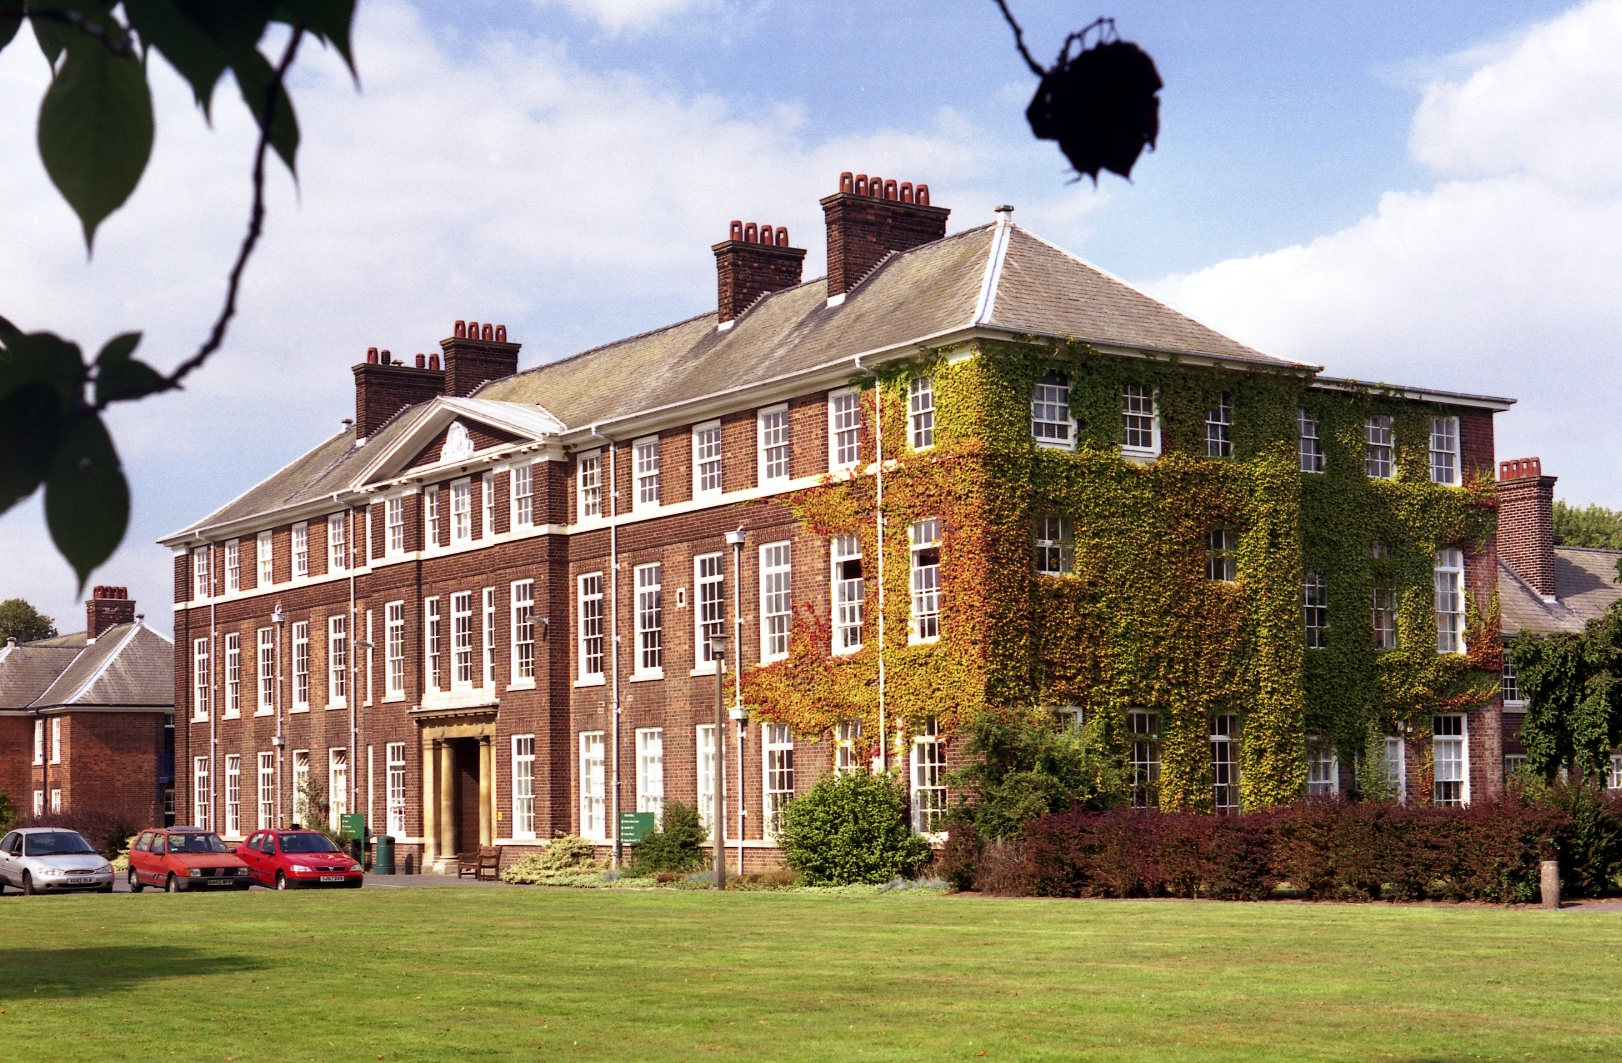 The Sutton Bonington campus